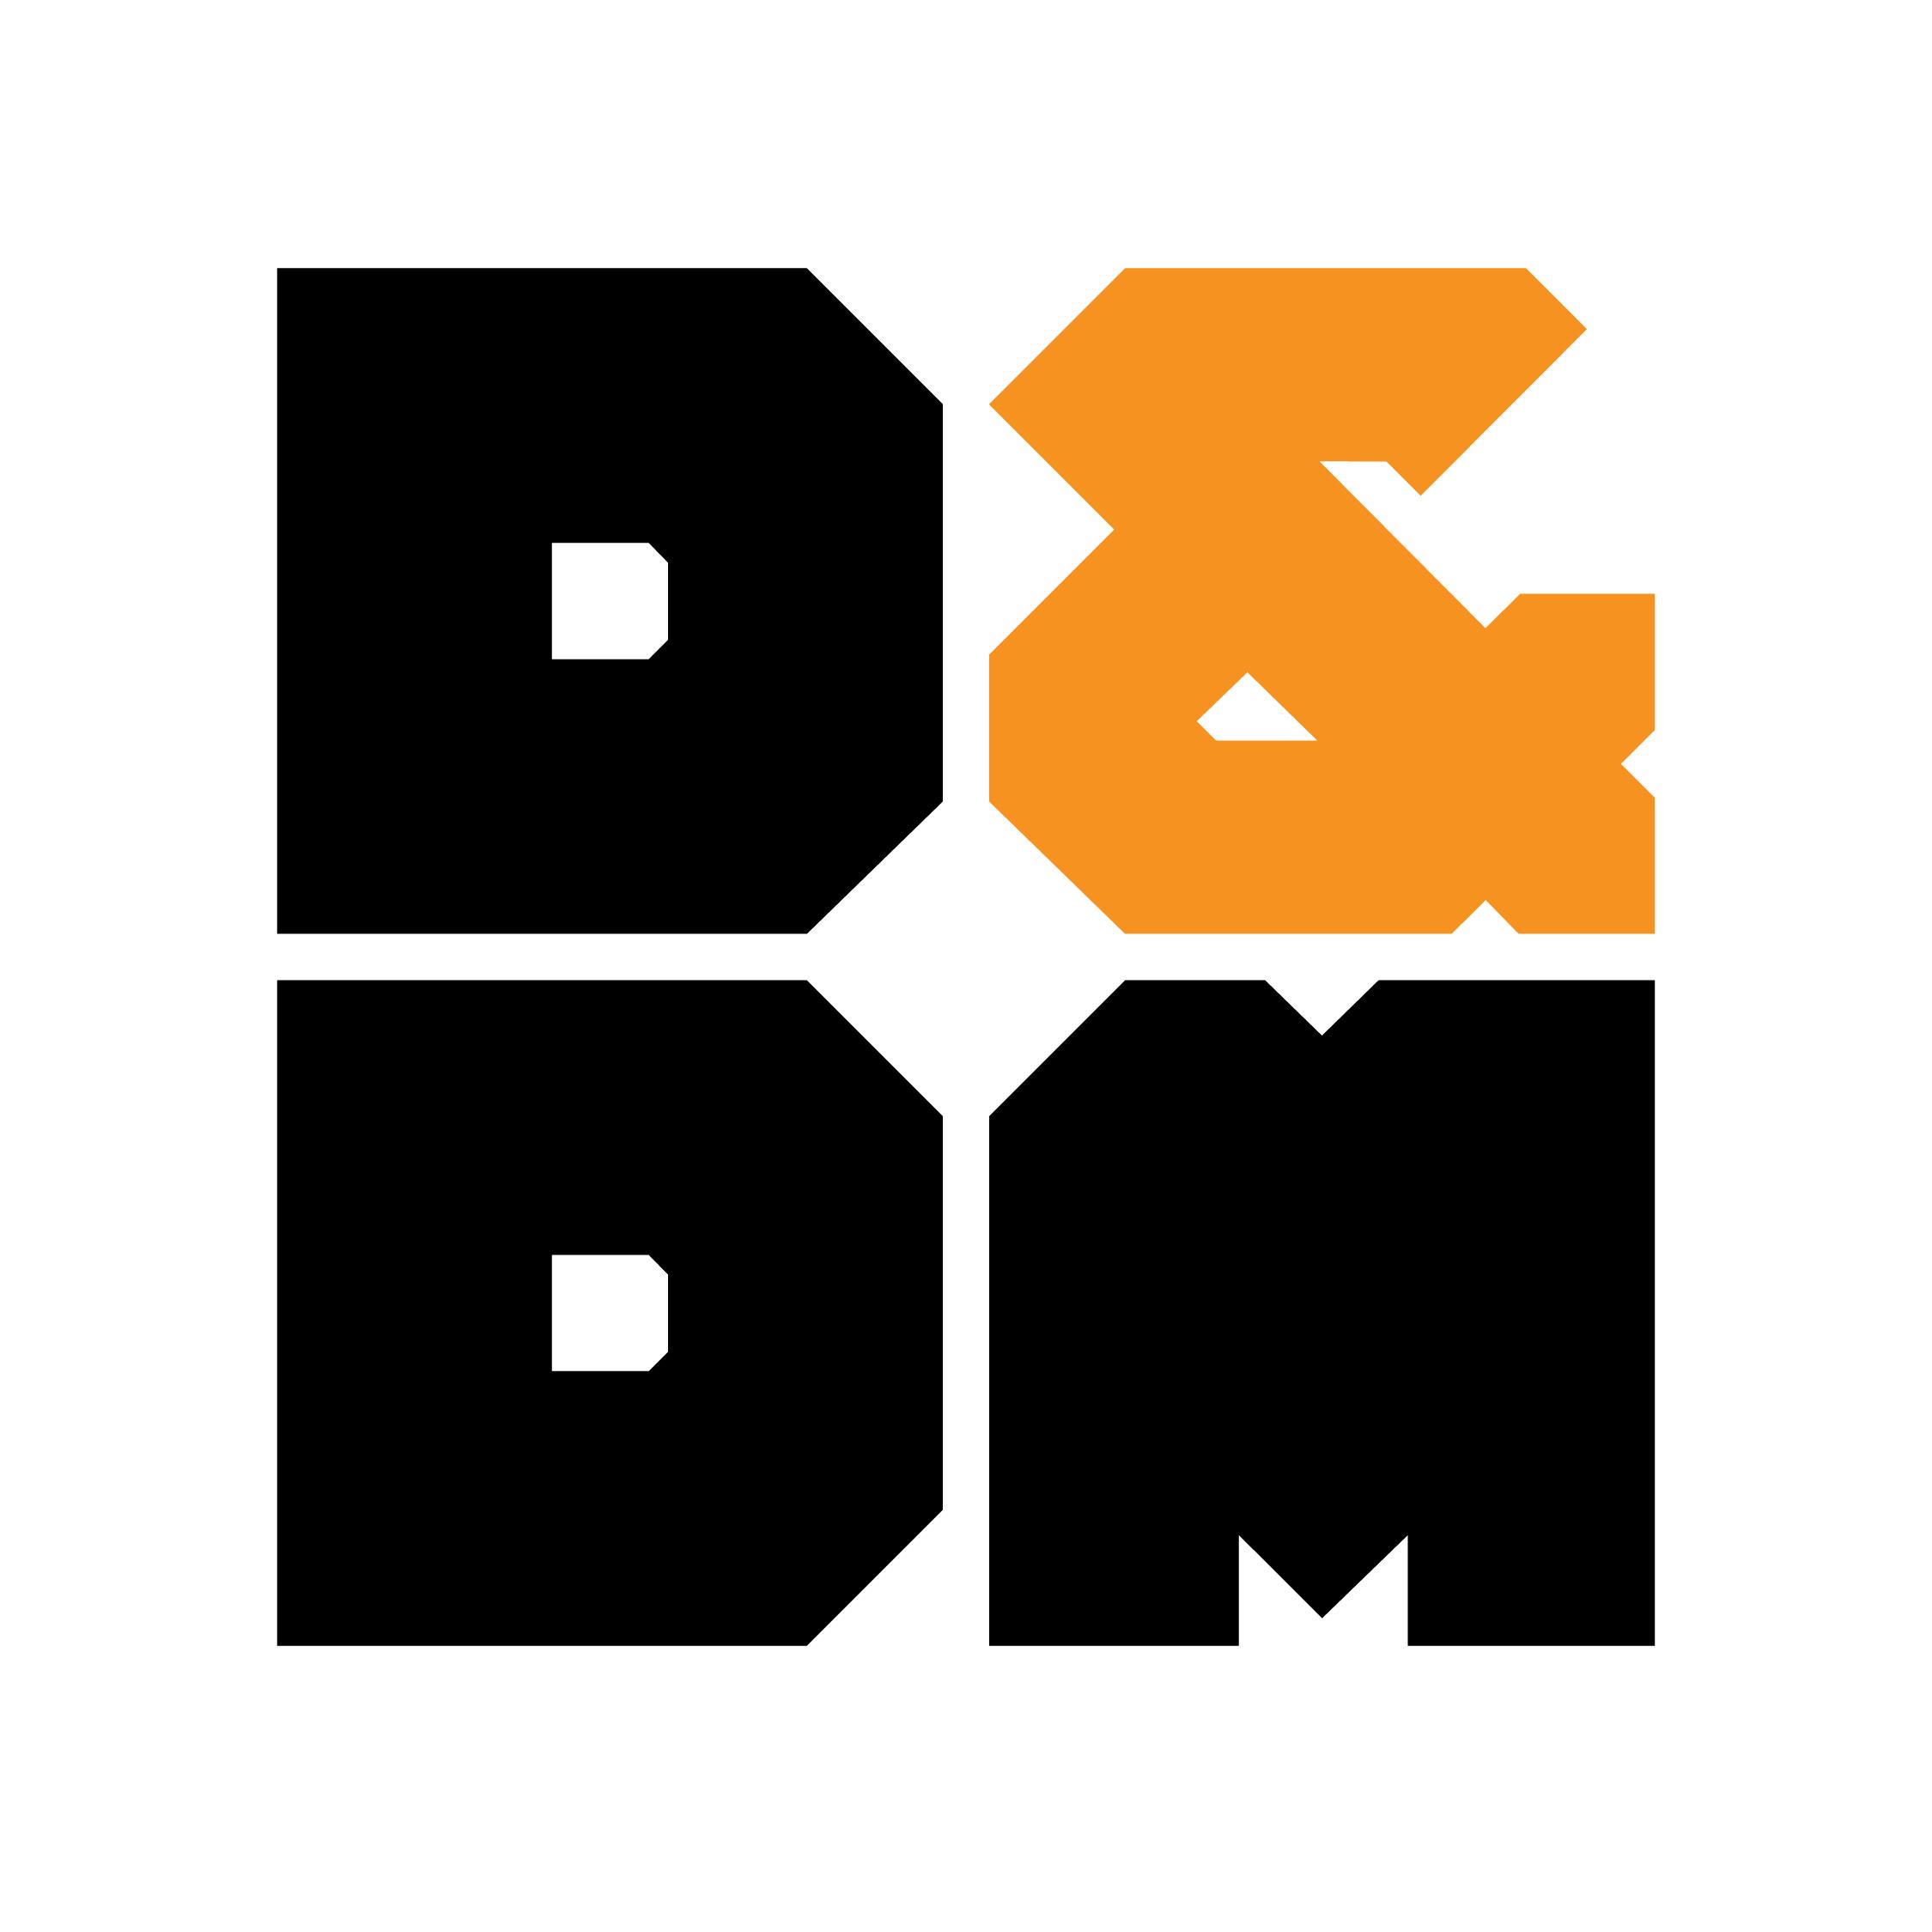 ddm_logo_2018_01_color.jpg